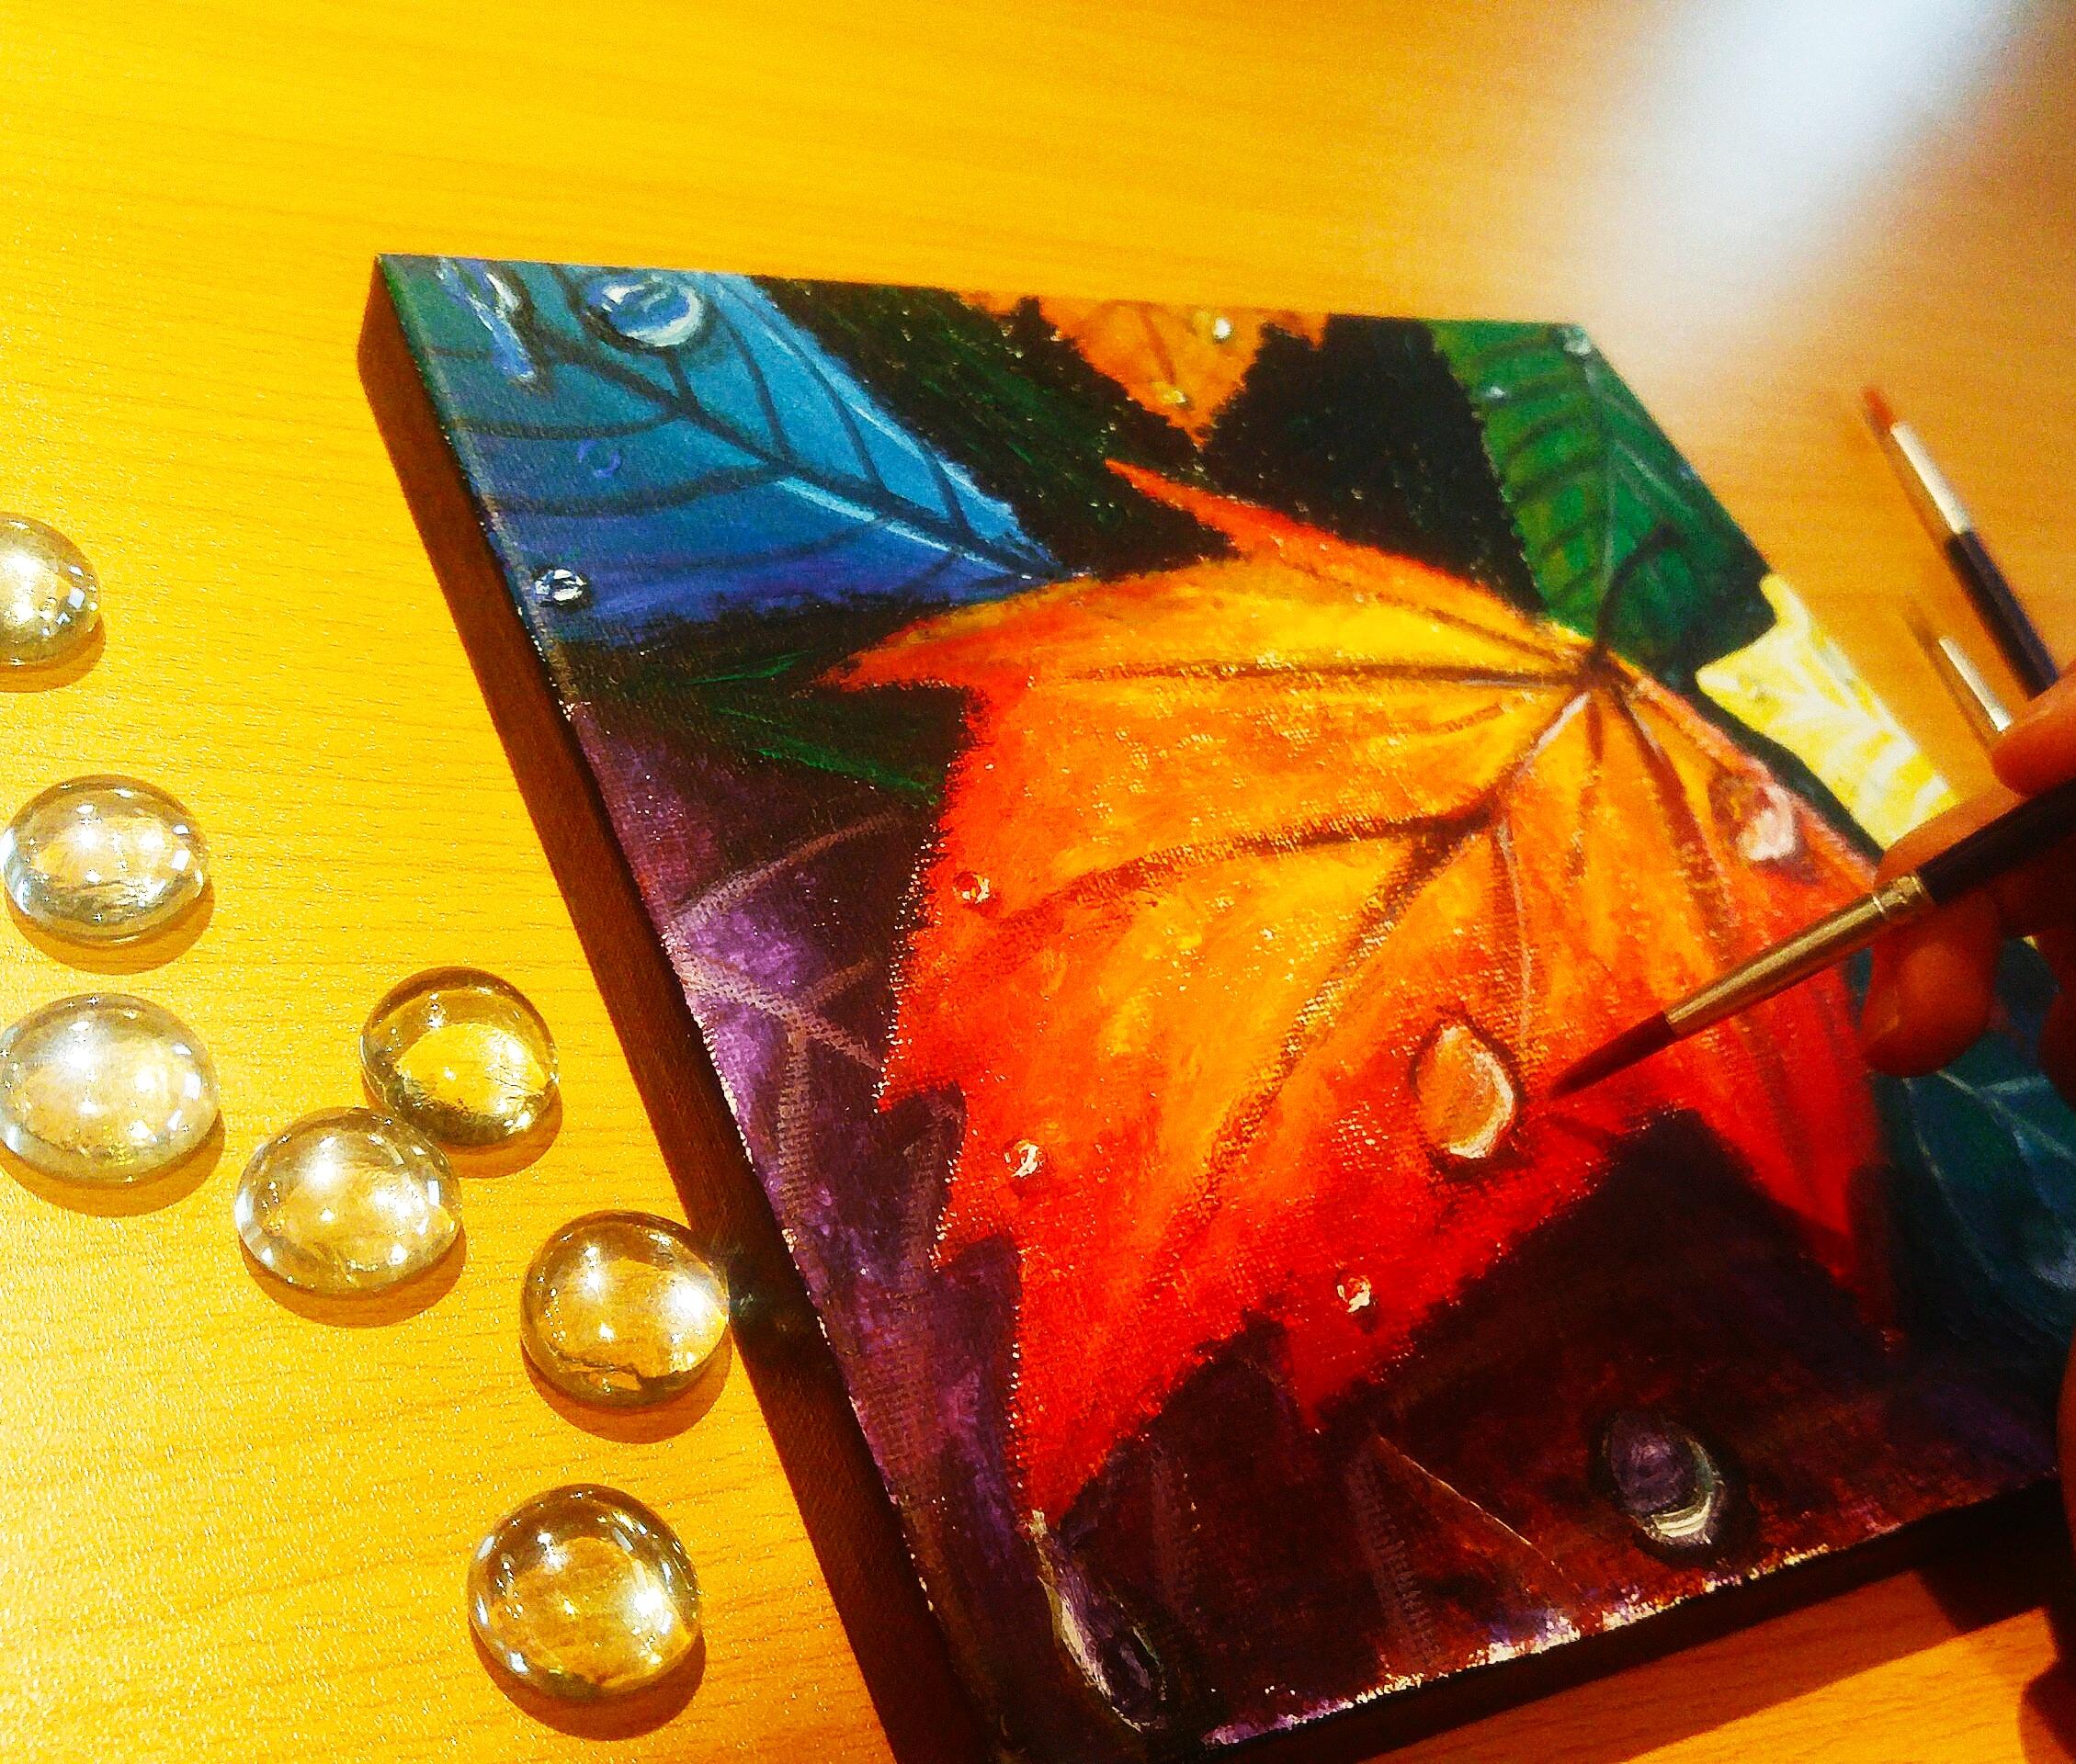 Glass Stone x Painting x Home Decoration Workshop - K11 Art Infinity - K11